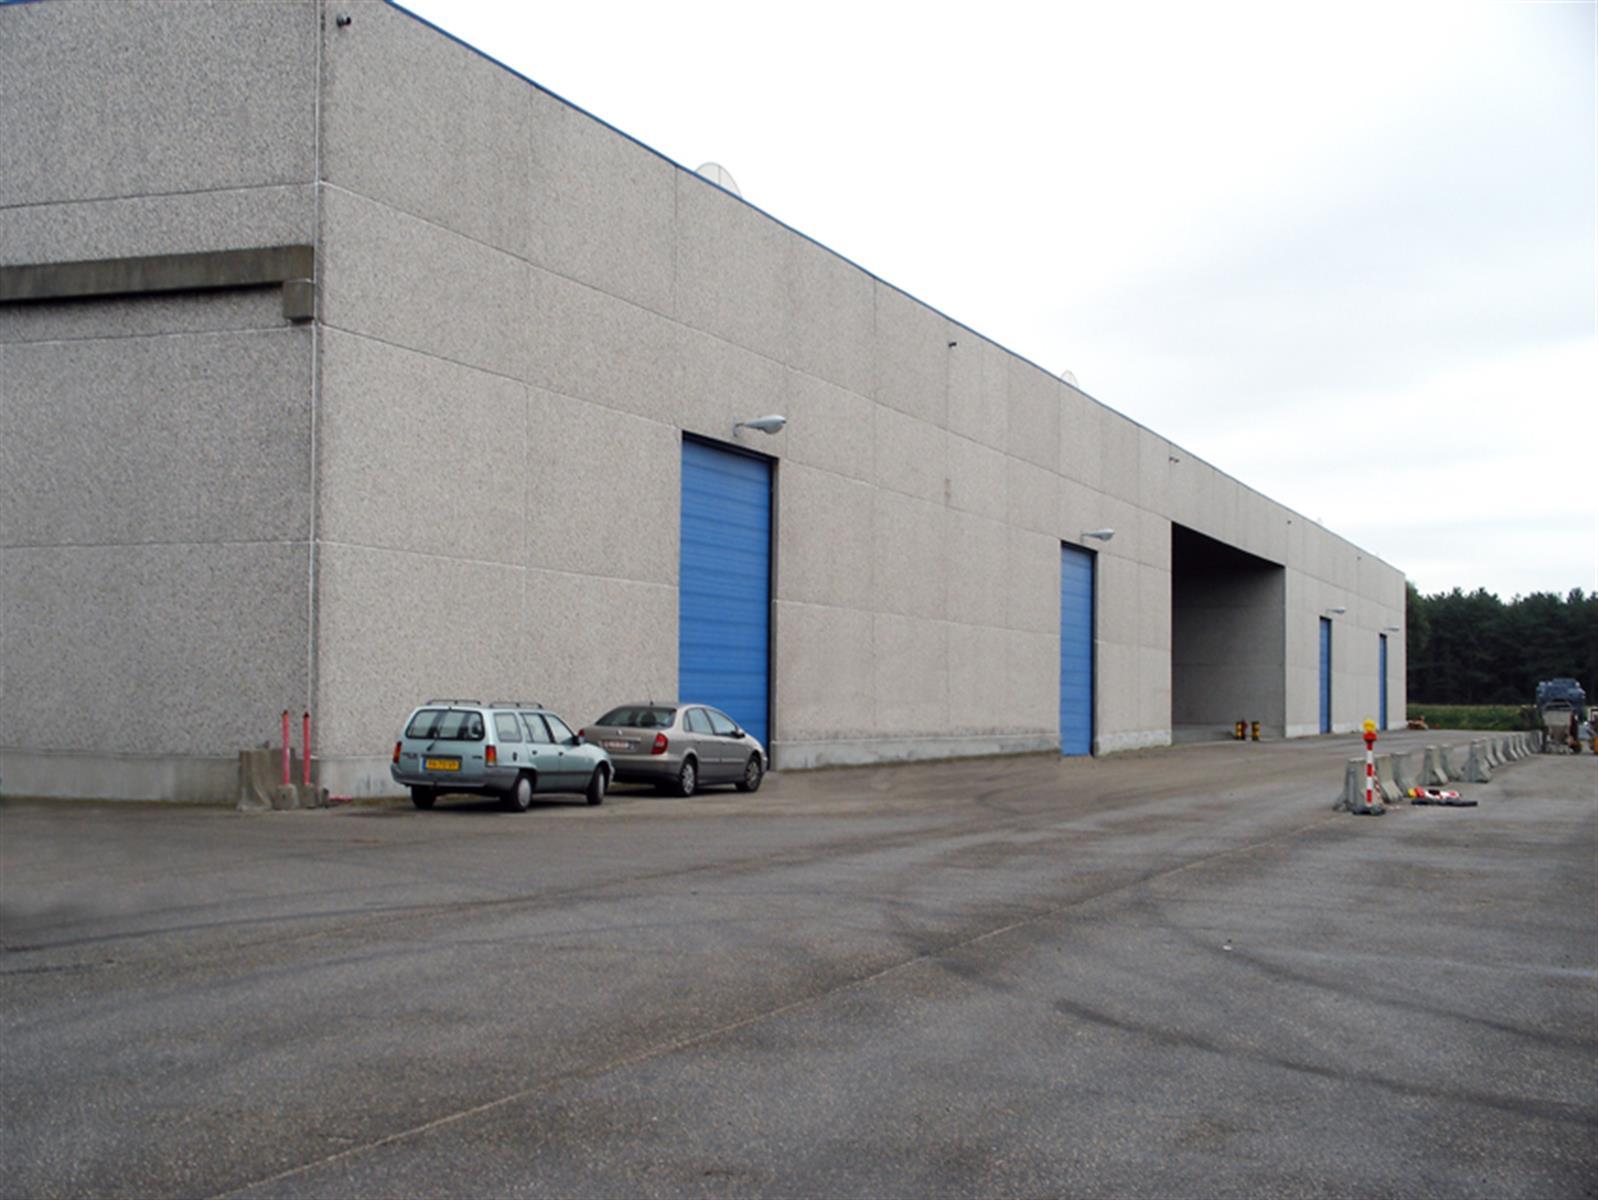 industrieel gebouw te huur KMO UNIT 1620m² MEERDERE LOADING DOCKS te KAPELLEN (B002) 1640m² - 2950 Kapellen, België 8